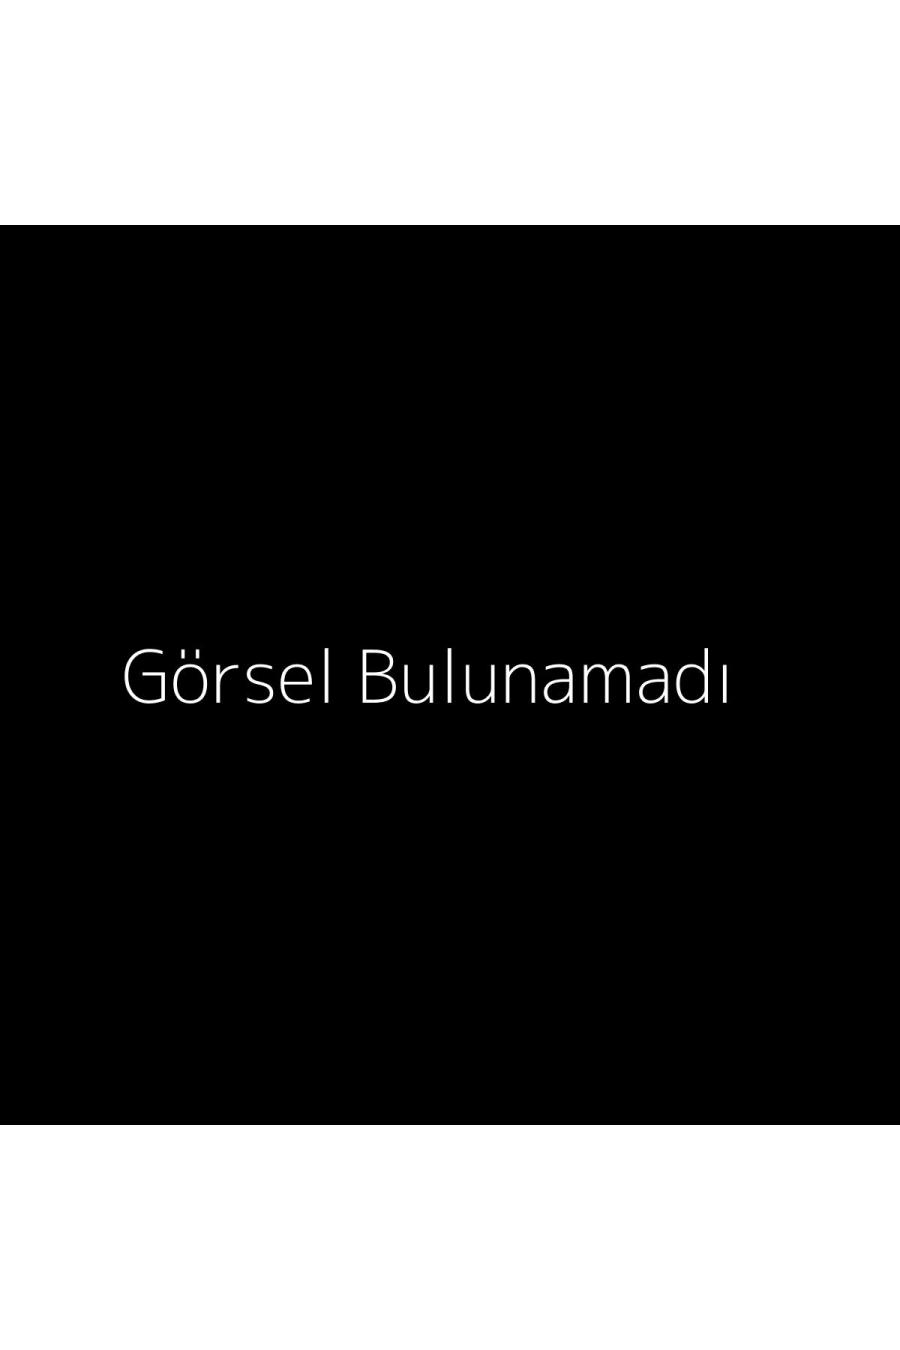 WHITE CORNERED CANDLE